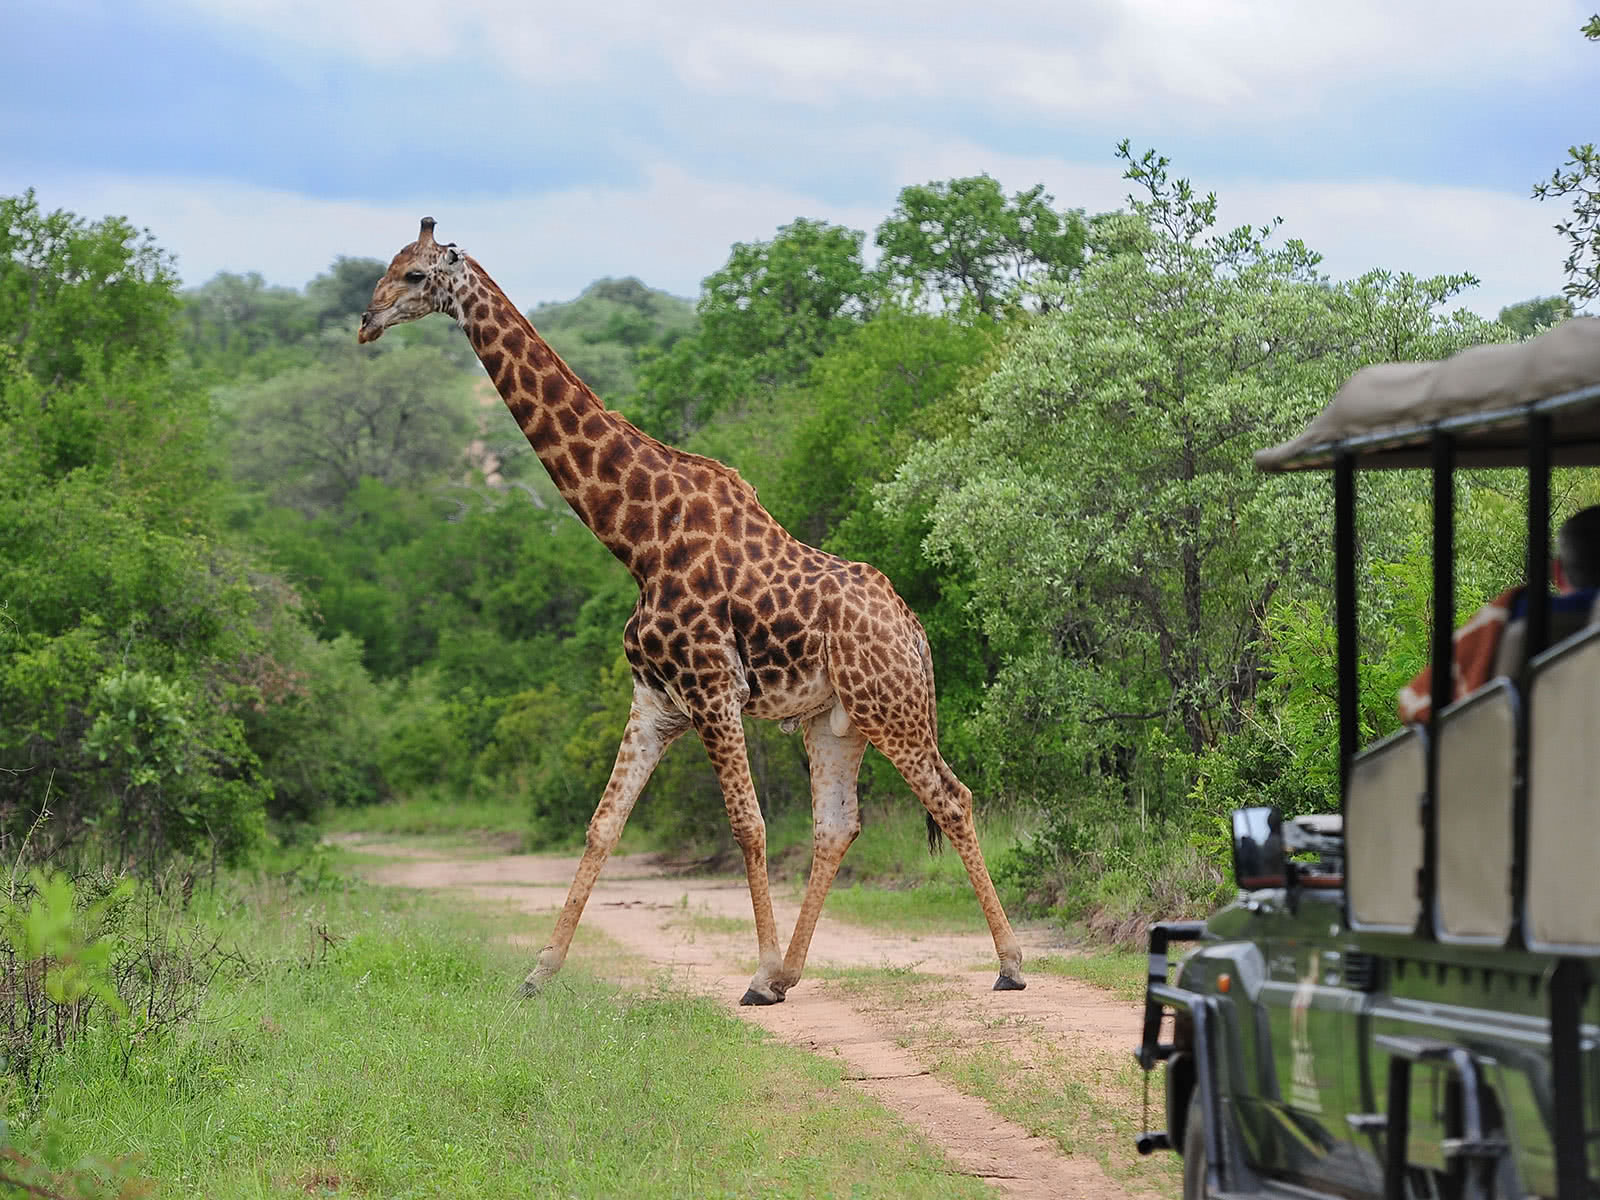 fitzpatricks_at_jock_Safari